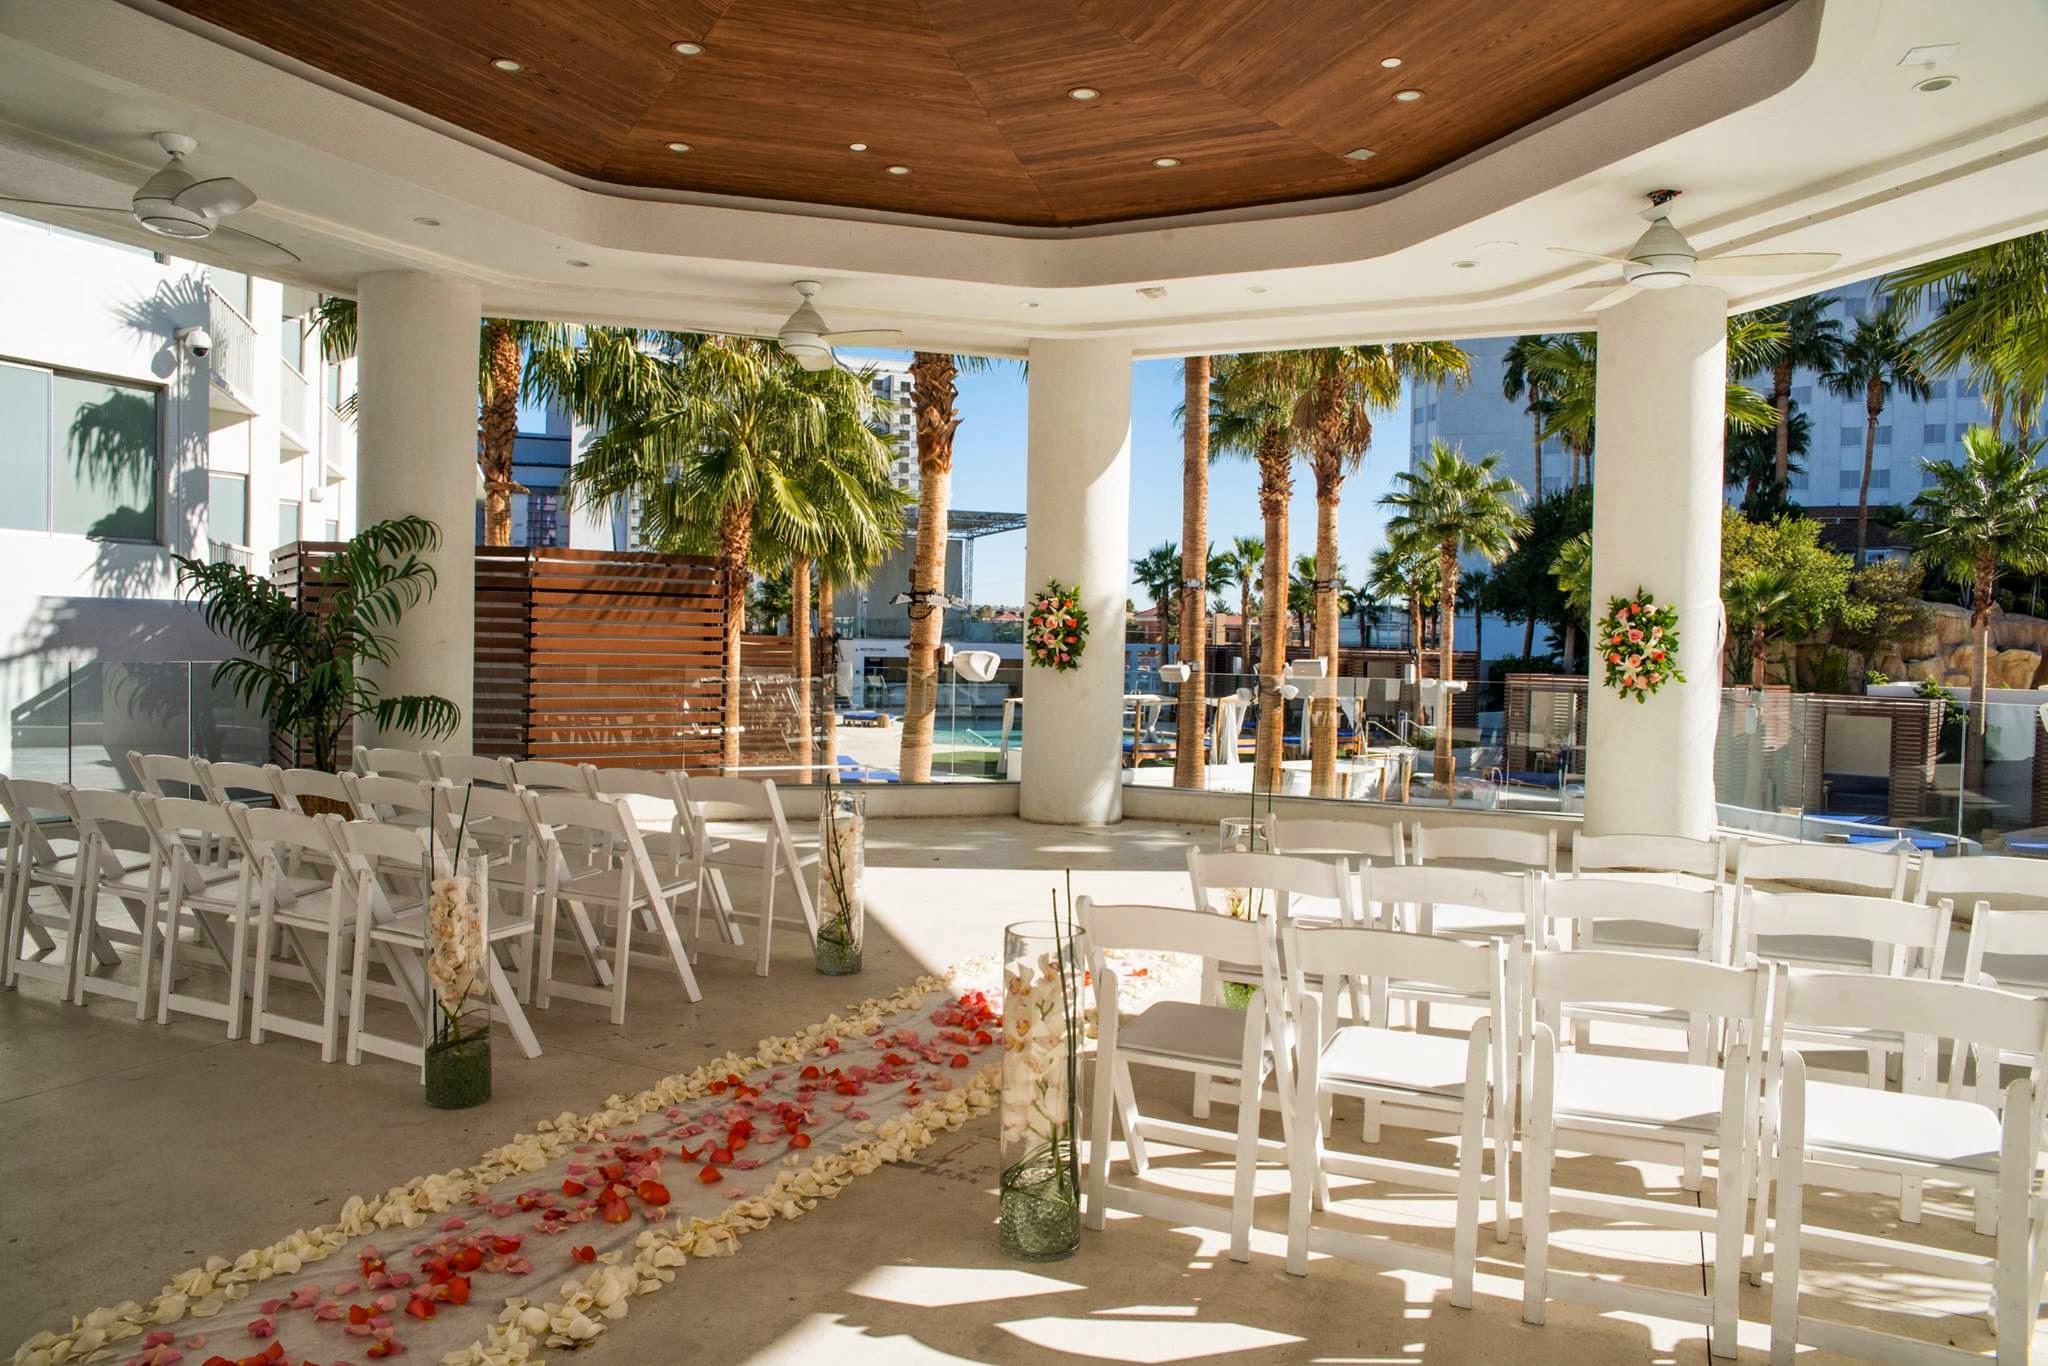 Havana Room And Beach Club Veranda Location At Tropicana Las Vegas Wedding